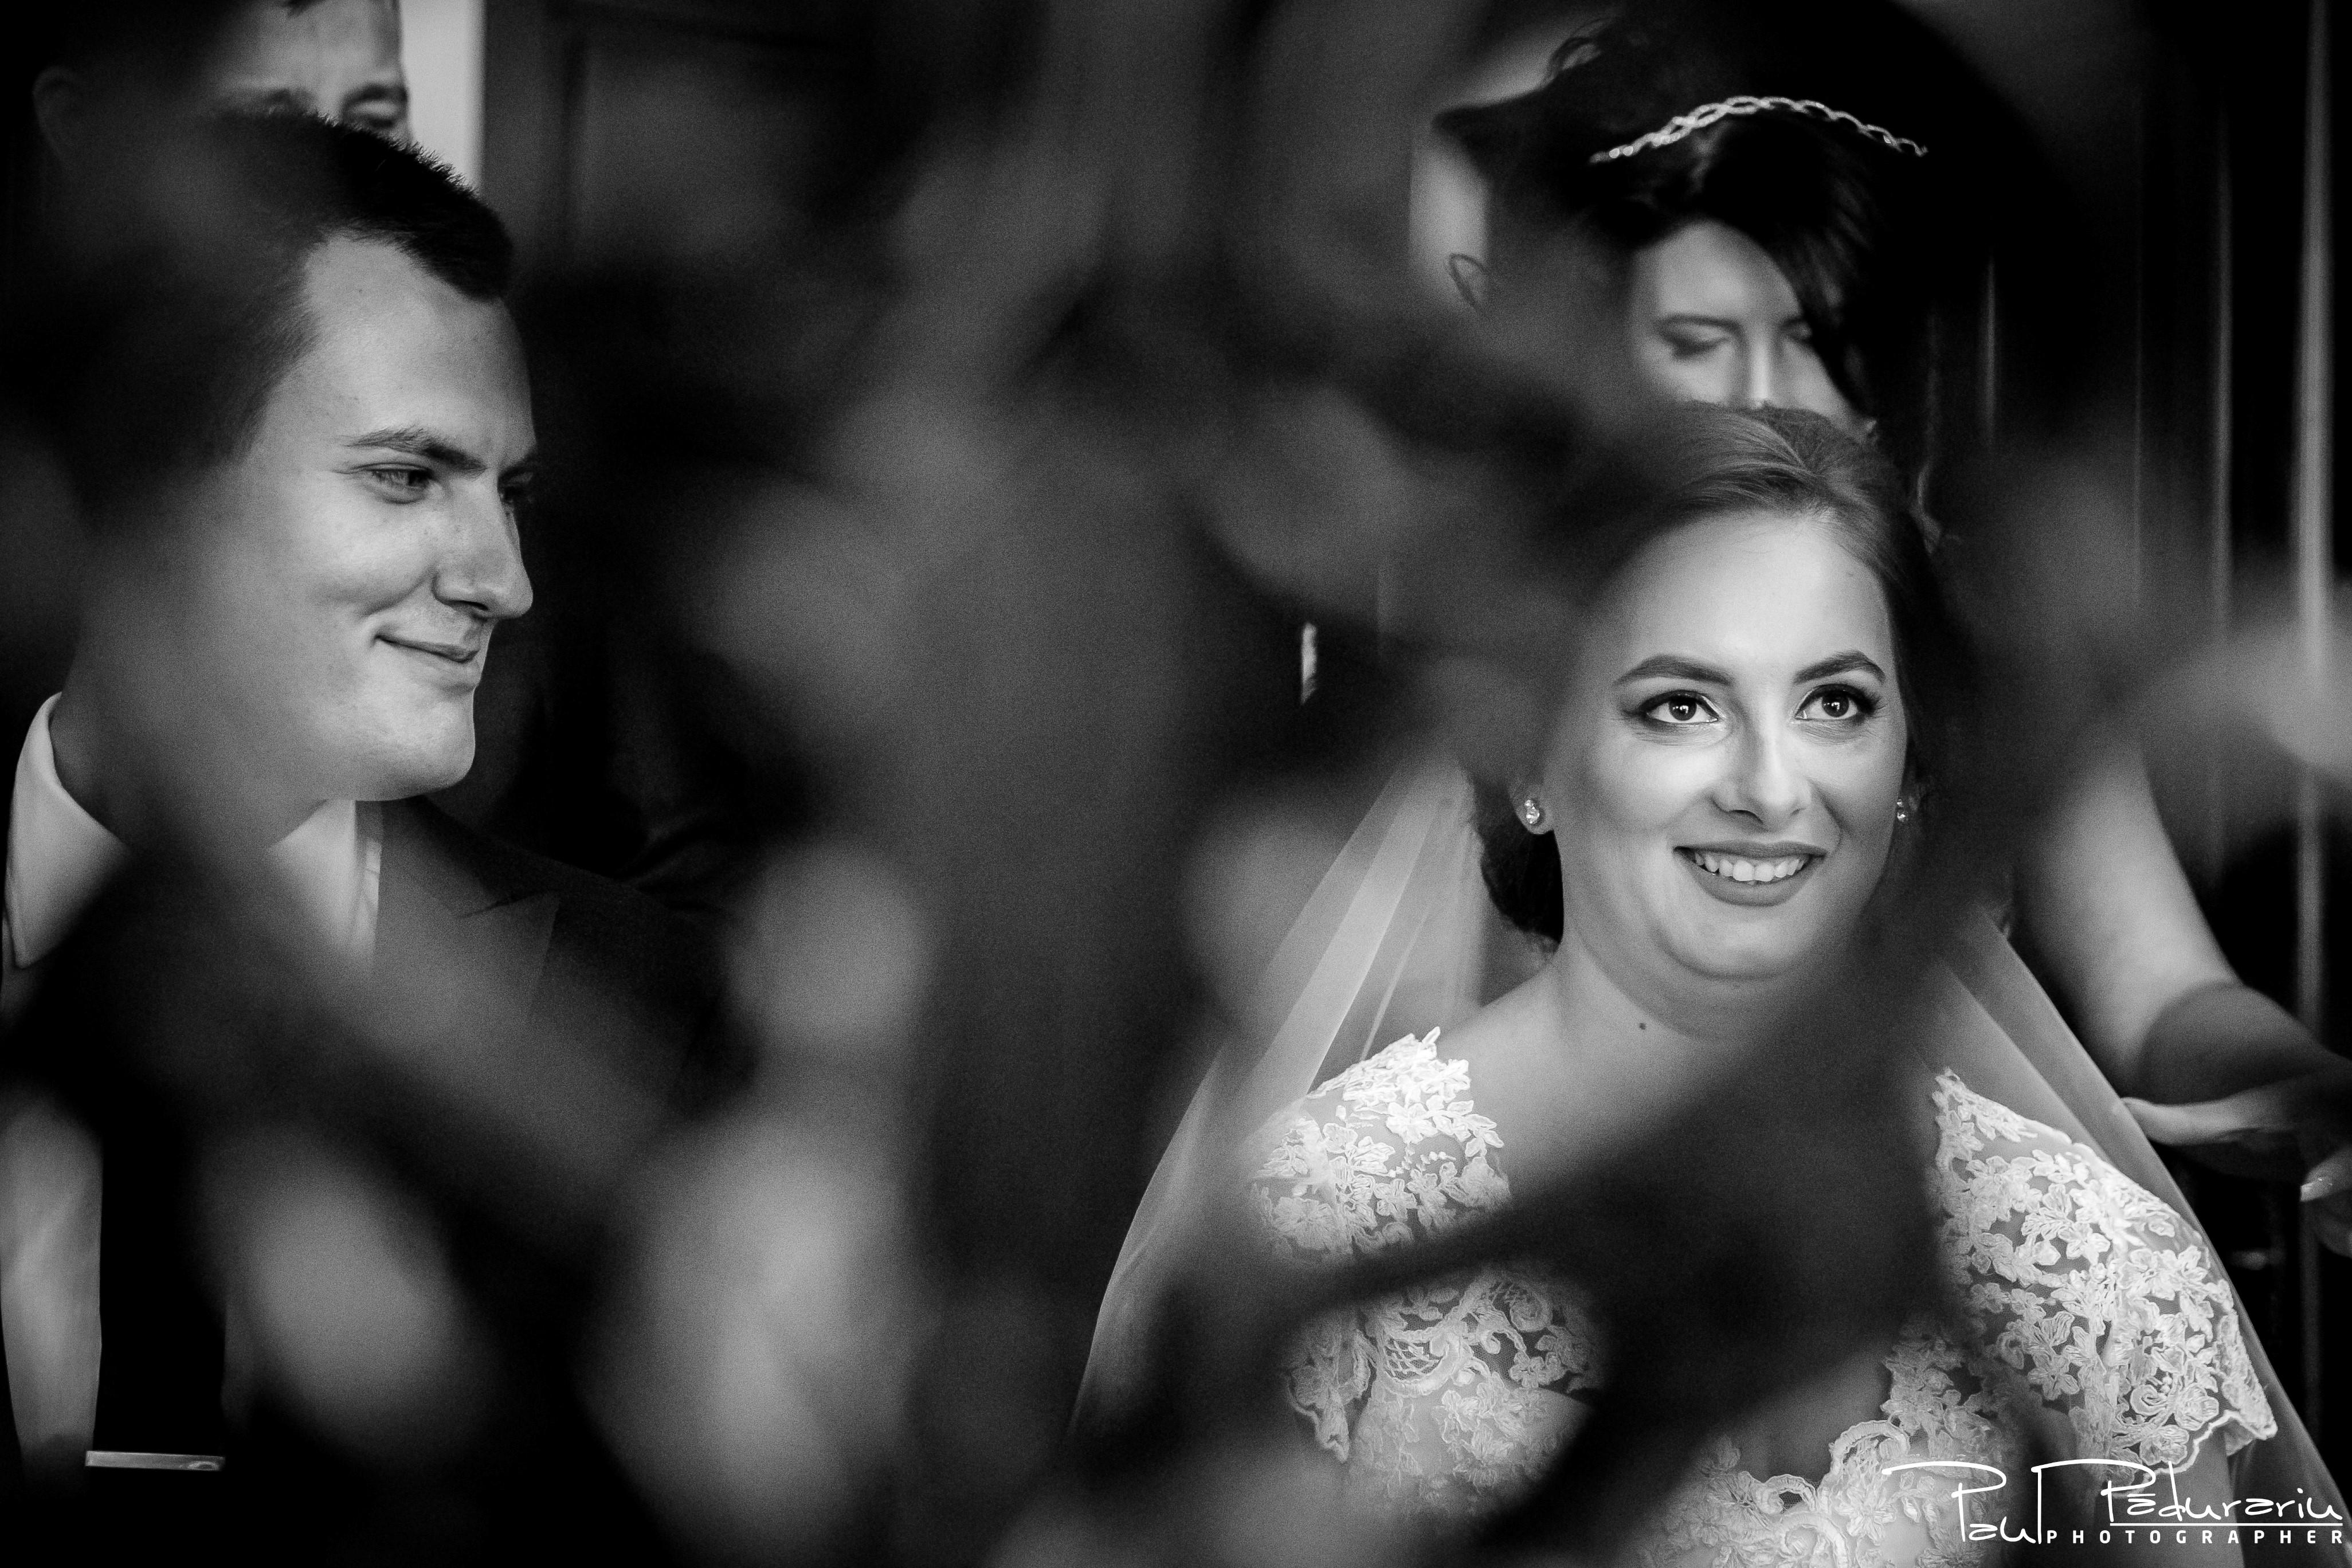 Cristina si Razvan nunta rustica la Bellaria pregatiri miri acasa fotograf profesionist nunta Iasi www.paulpadurariu.ro © 2017 Paul Padurariu